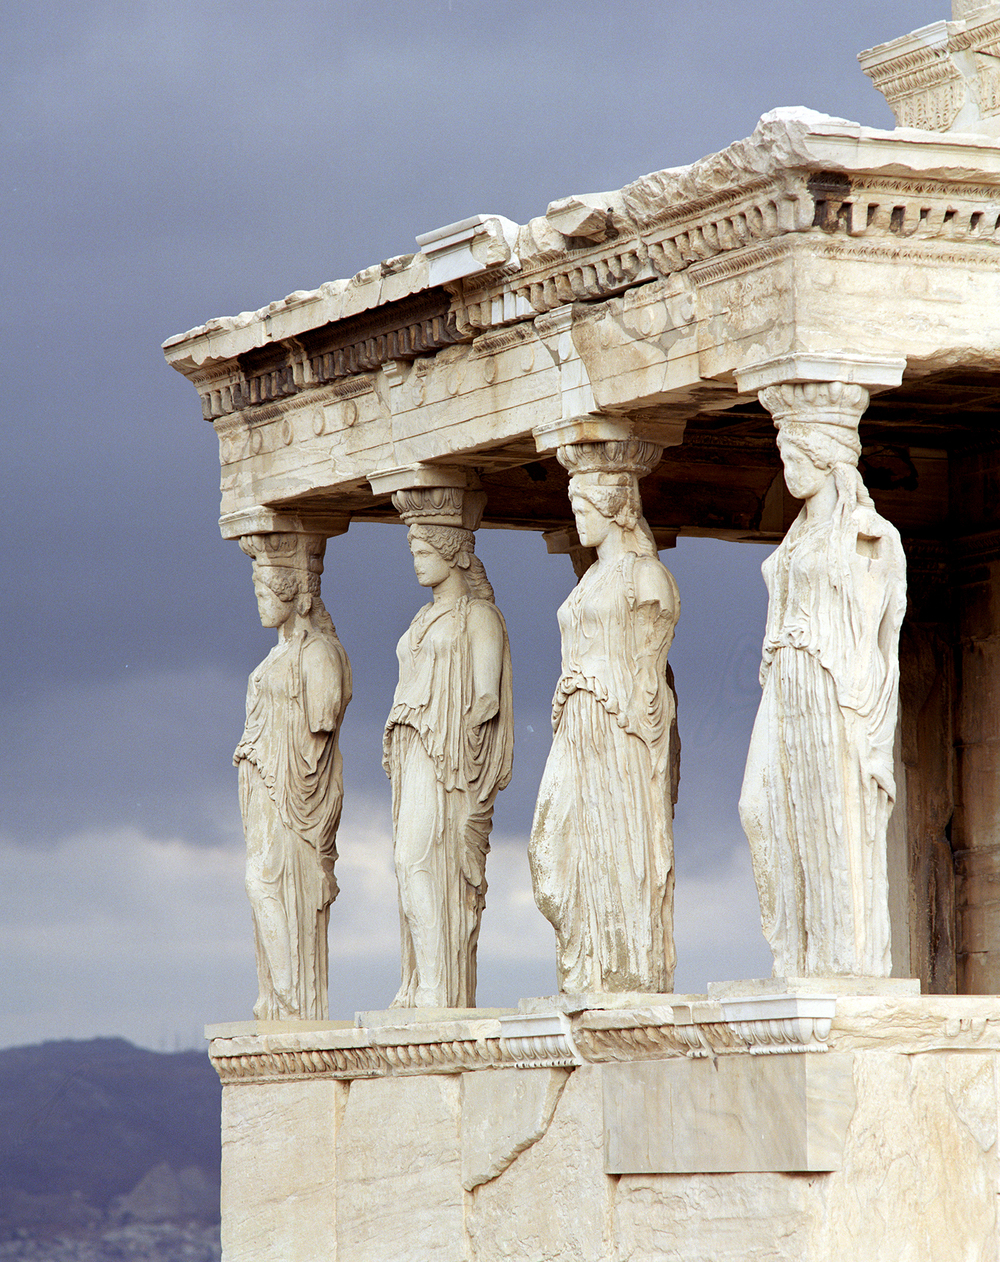 The Erectheon on the Acropolis